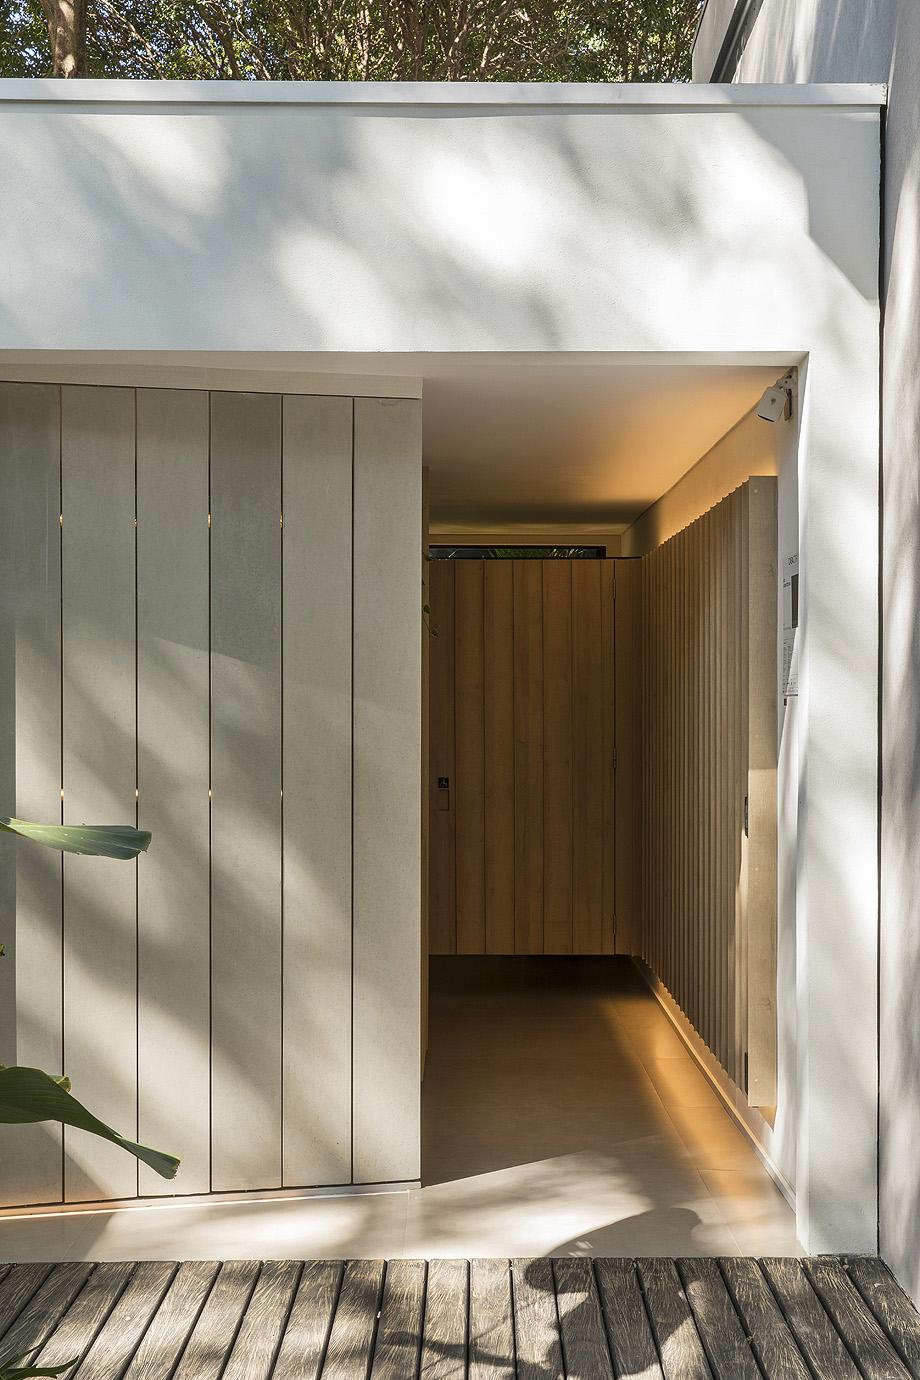 recinto do bosque de gdl arquitectura - foto felipe araujo (4)